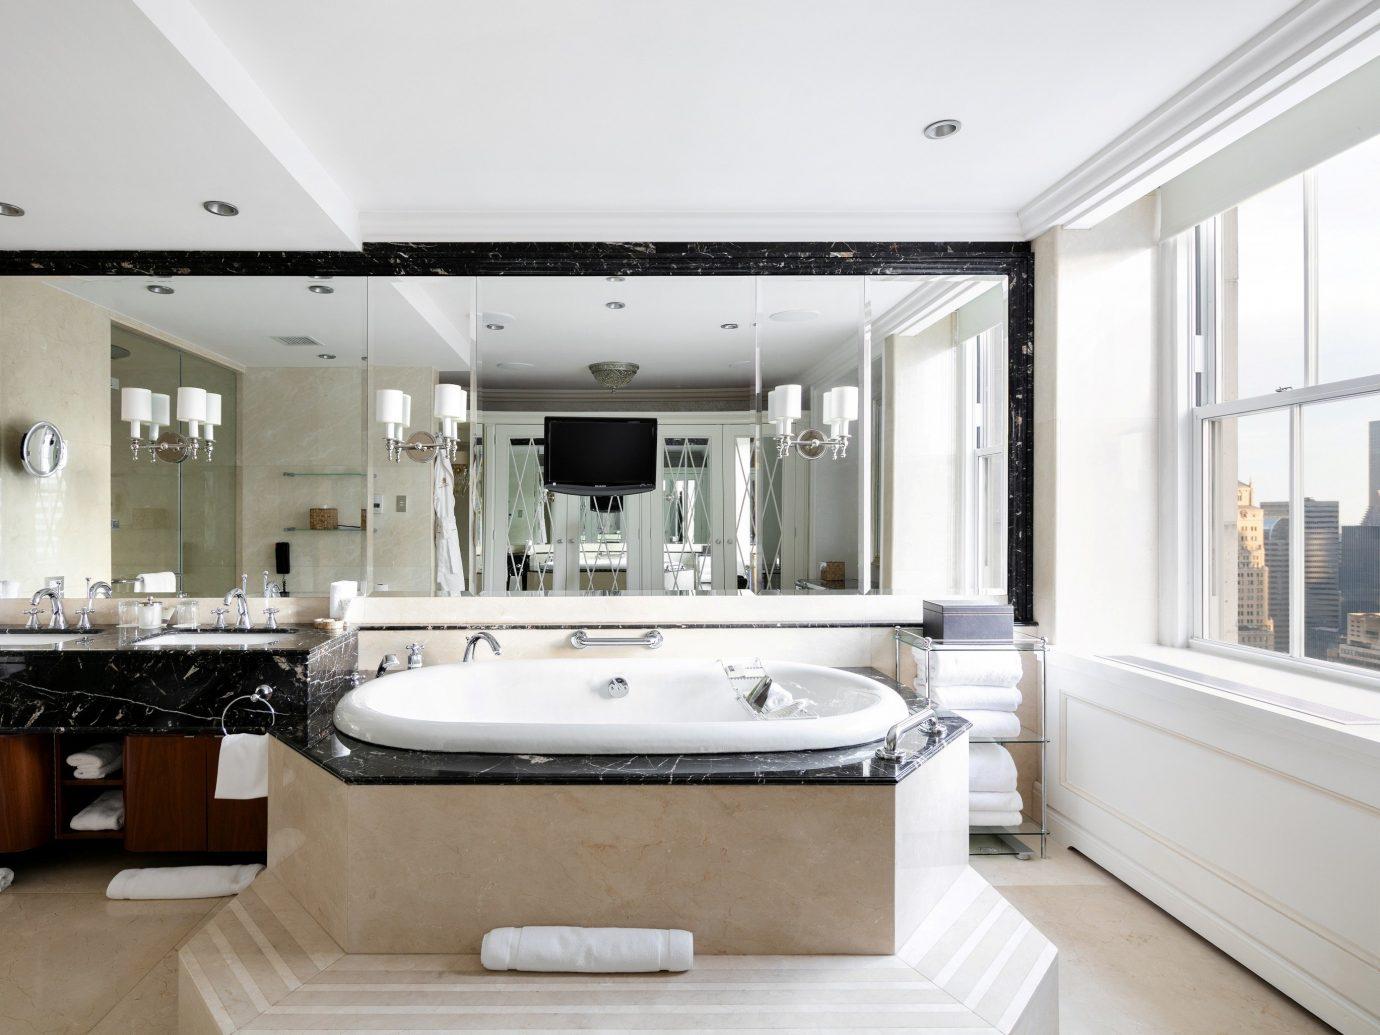 Hotels Luxury Travel indoor bathroom wall floor ceiling mirror window sink property room interior design estate tub bathtub home Suite plumbing fixture interior designer big toilet Bath Modern tile tiled